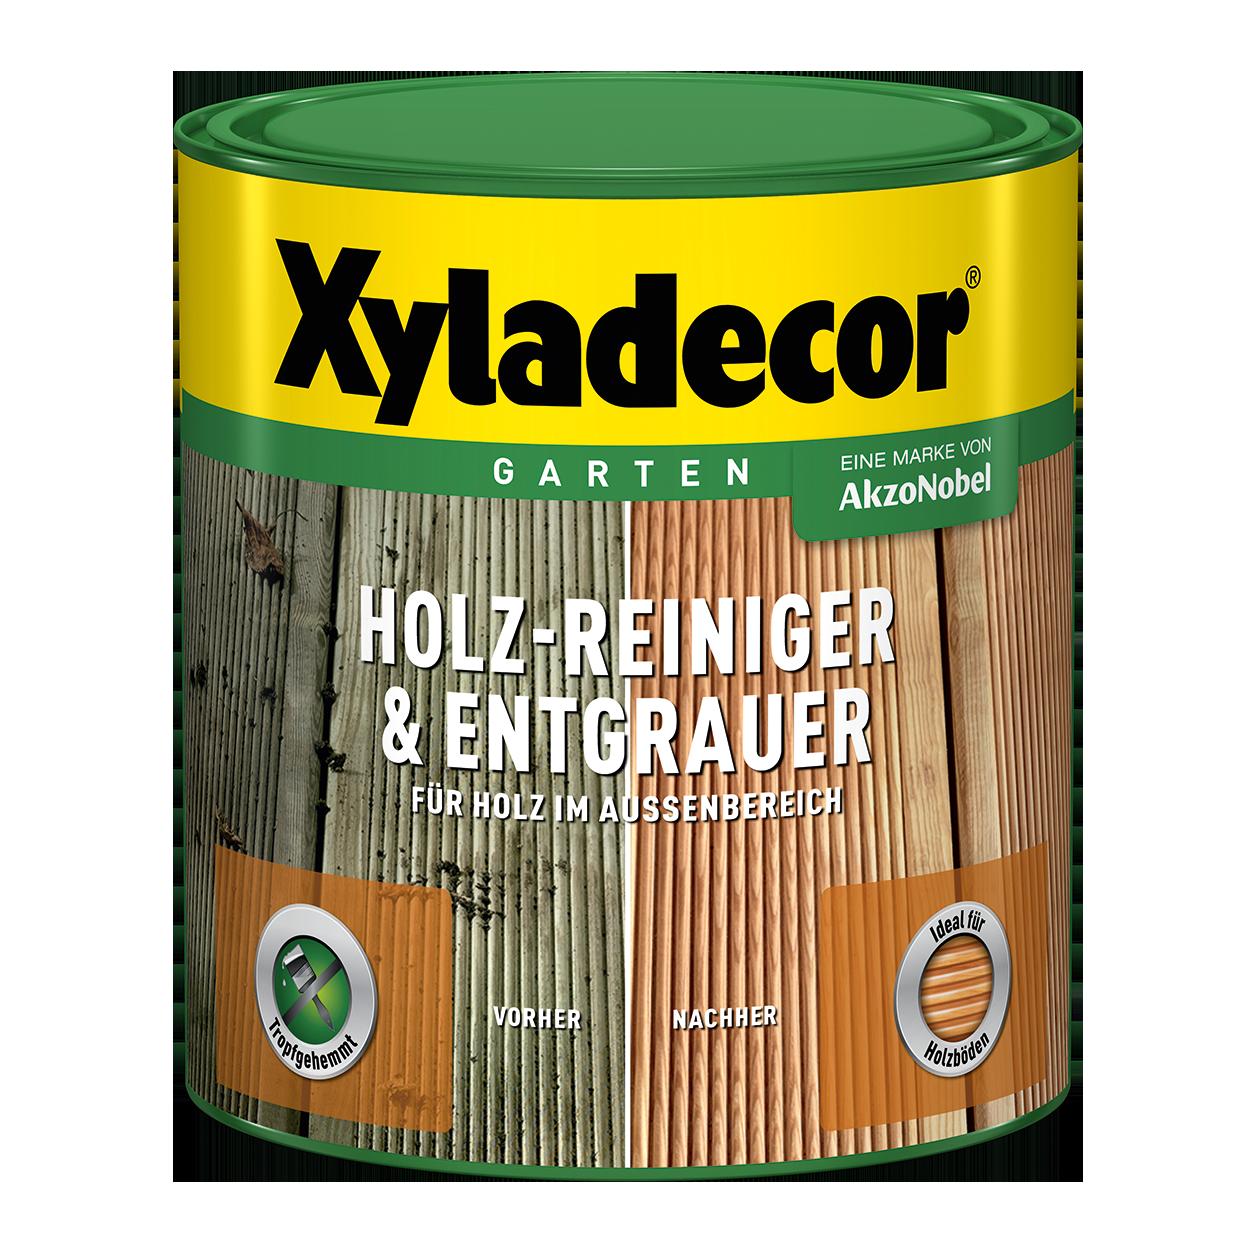 Xyladecor Holz-Reiniger & Entgrauer